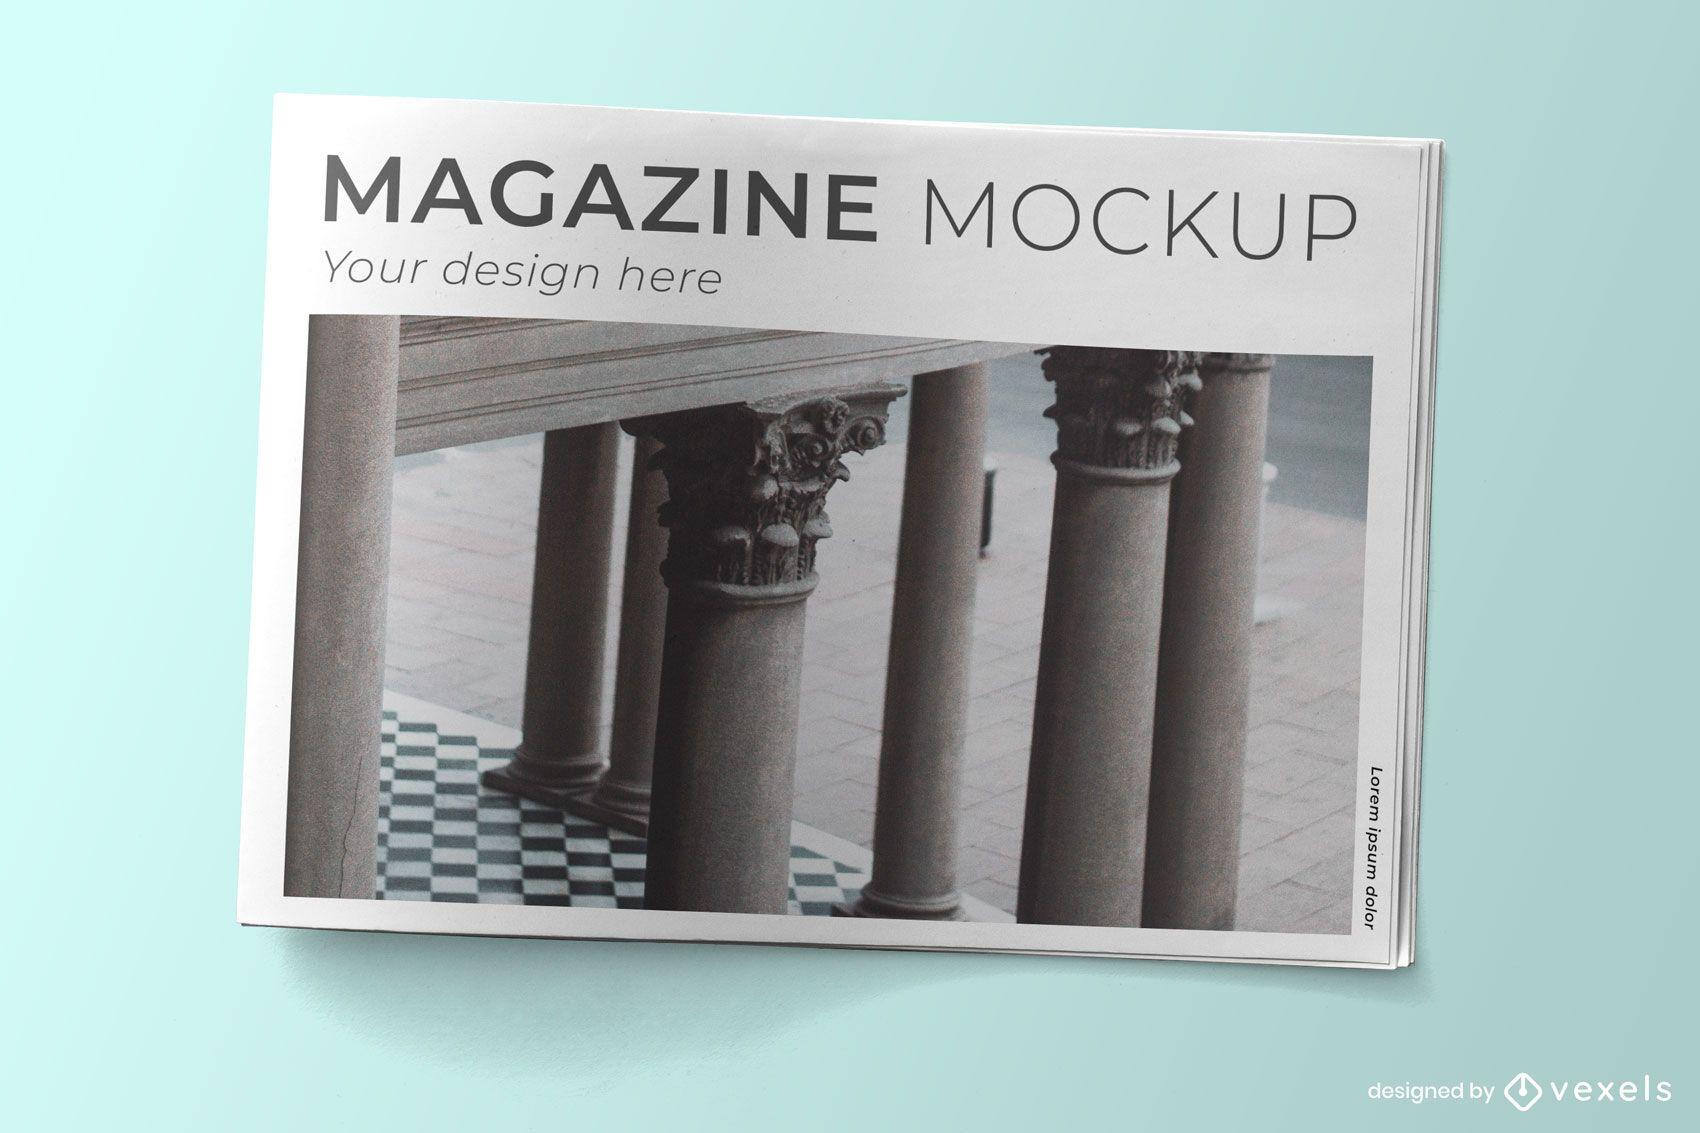 Diseño de maqueta psd de portada de revista